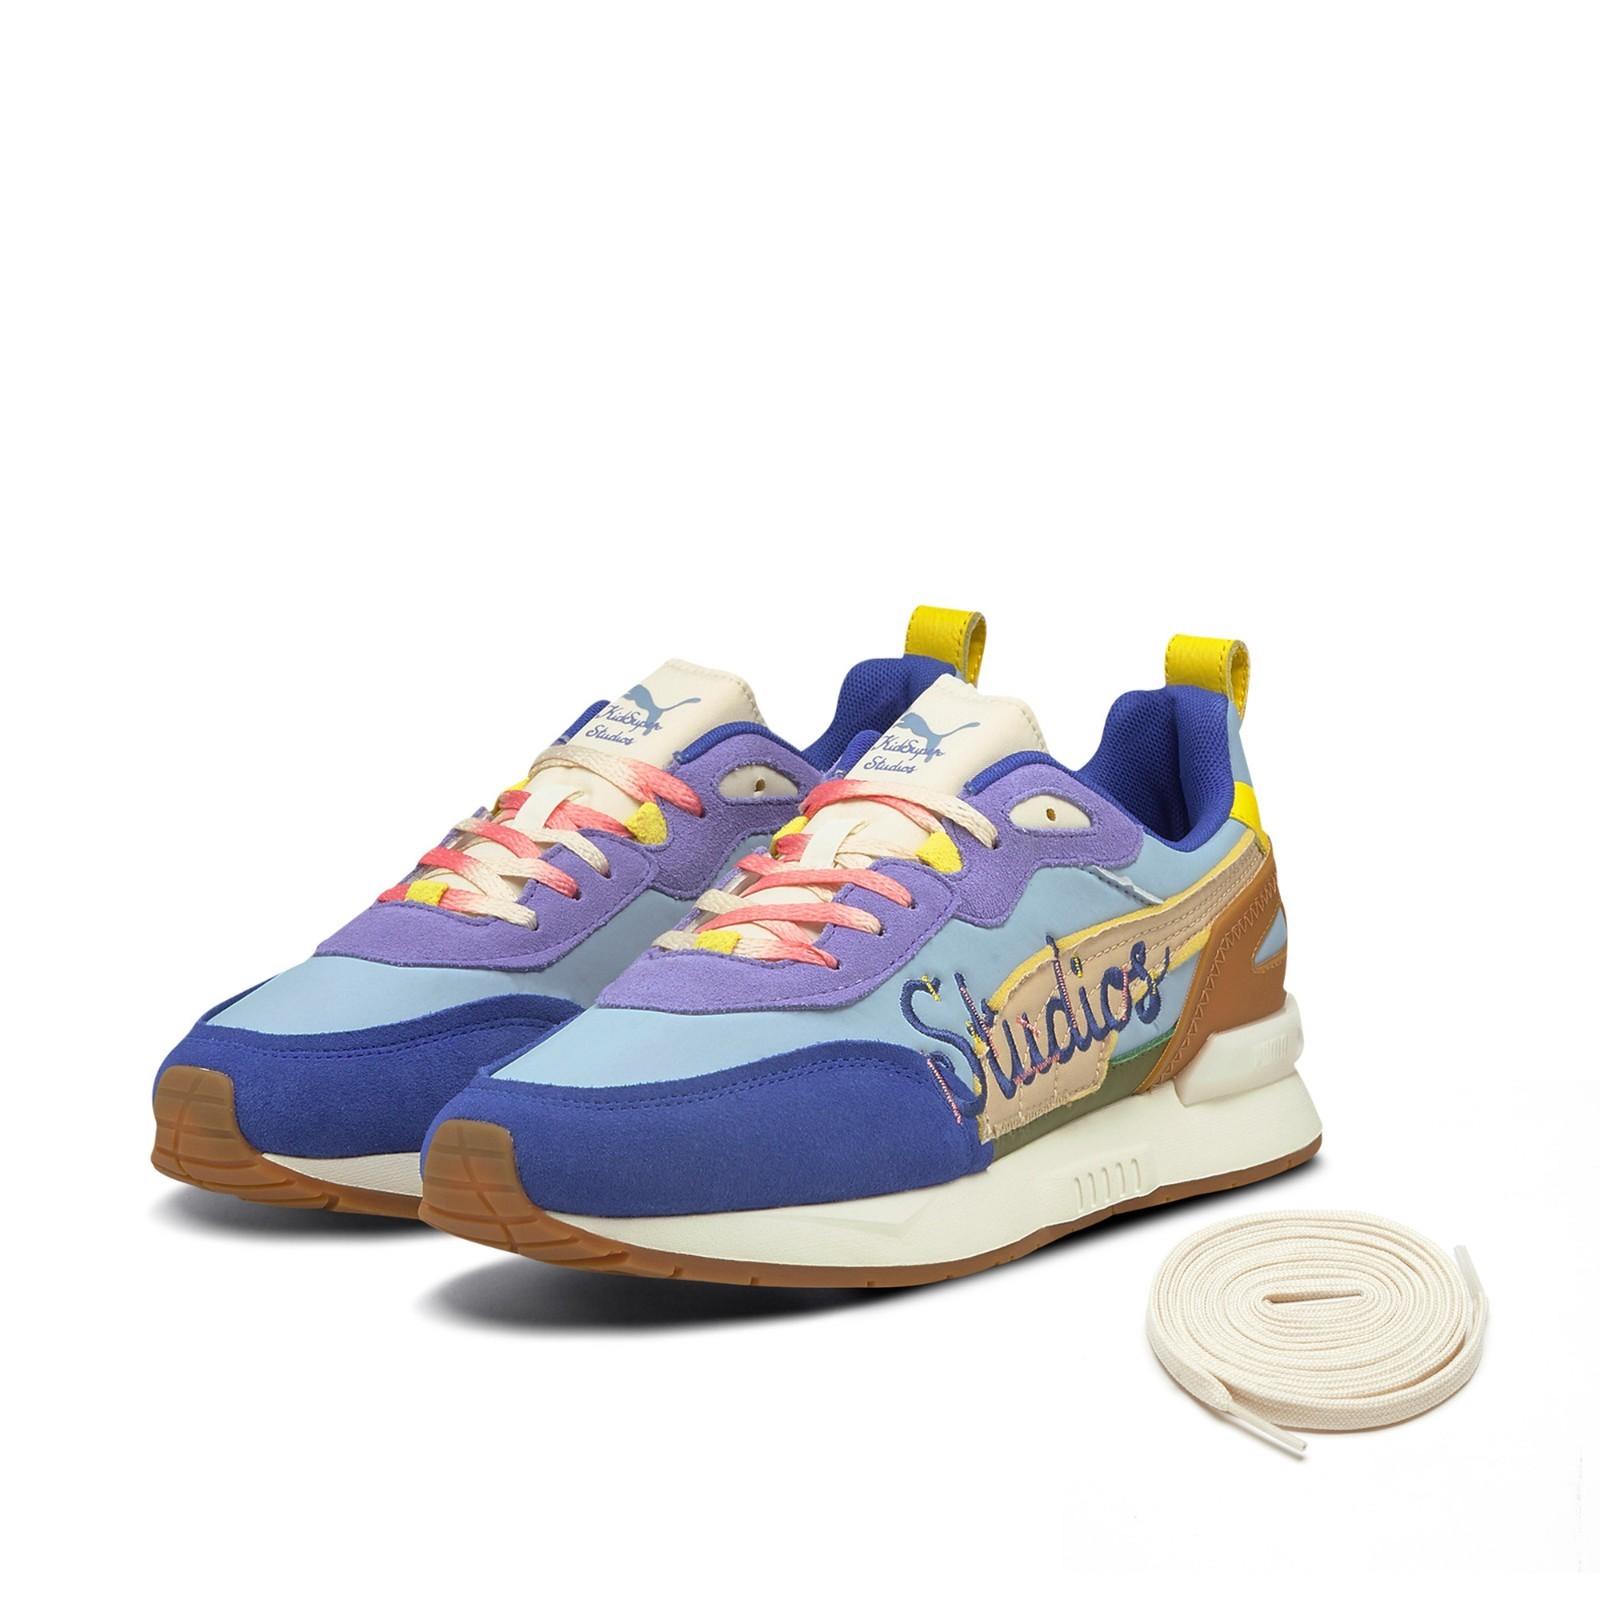 PUMA 彪马 16日0点:PUMA 彪马 KIDSUPER STUDIOS联名款 375189 中性休闲运动鞋